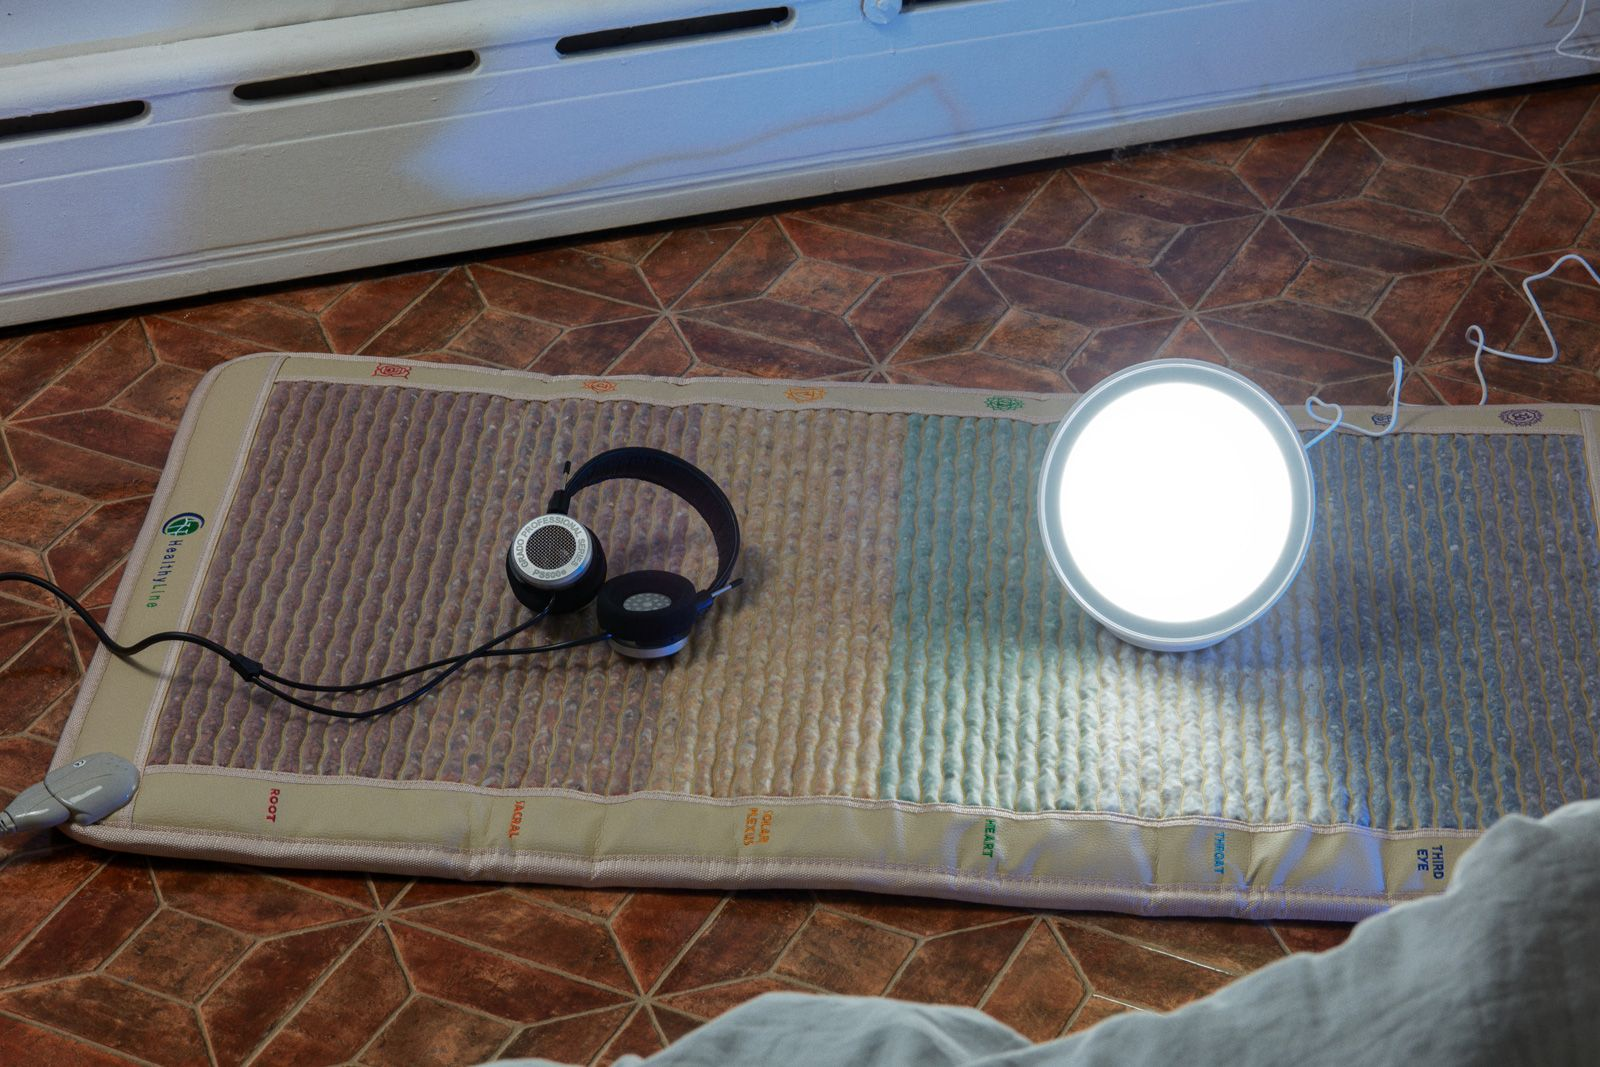 Mat: PEMF, Headphones: GRADO, Light: CIRCADIAN OPTICS